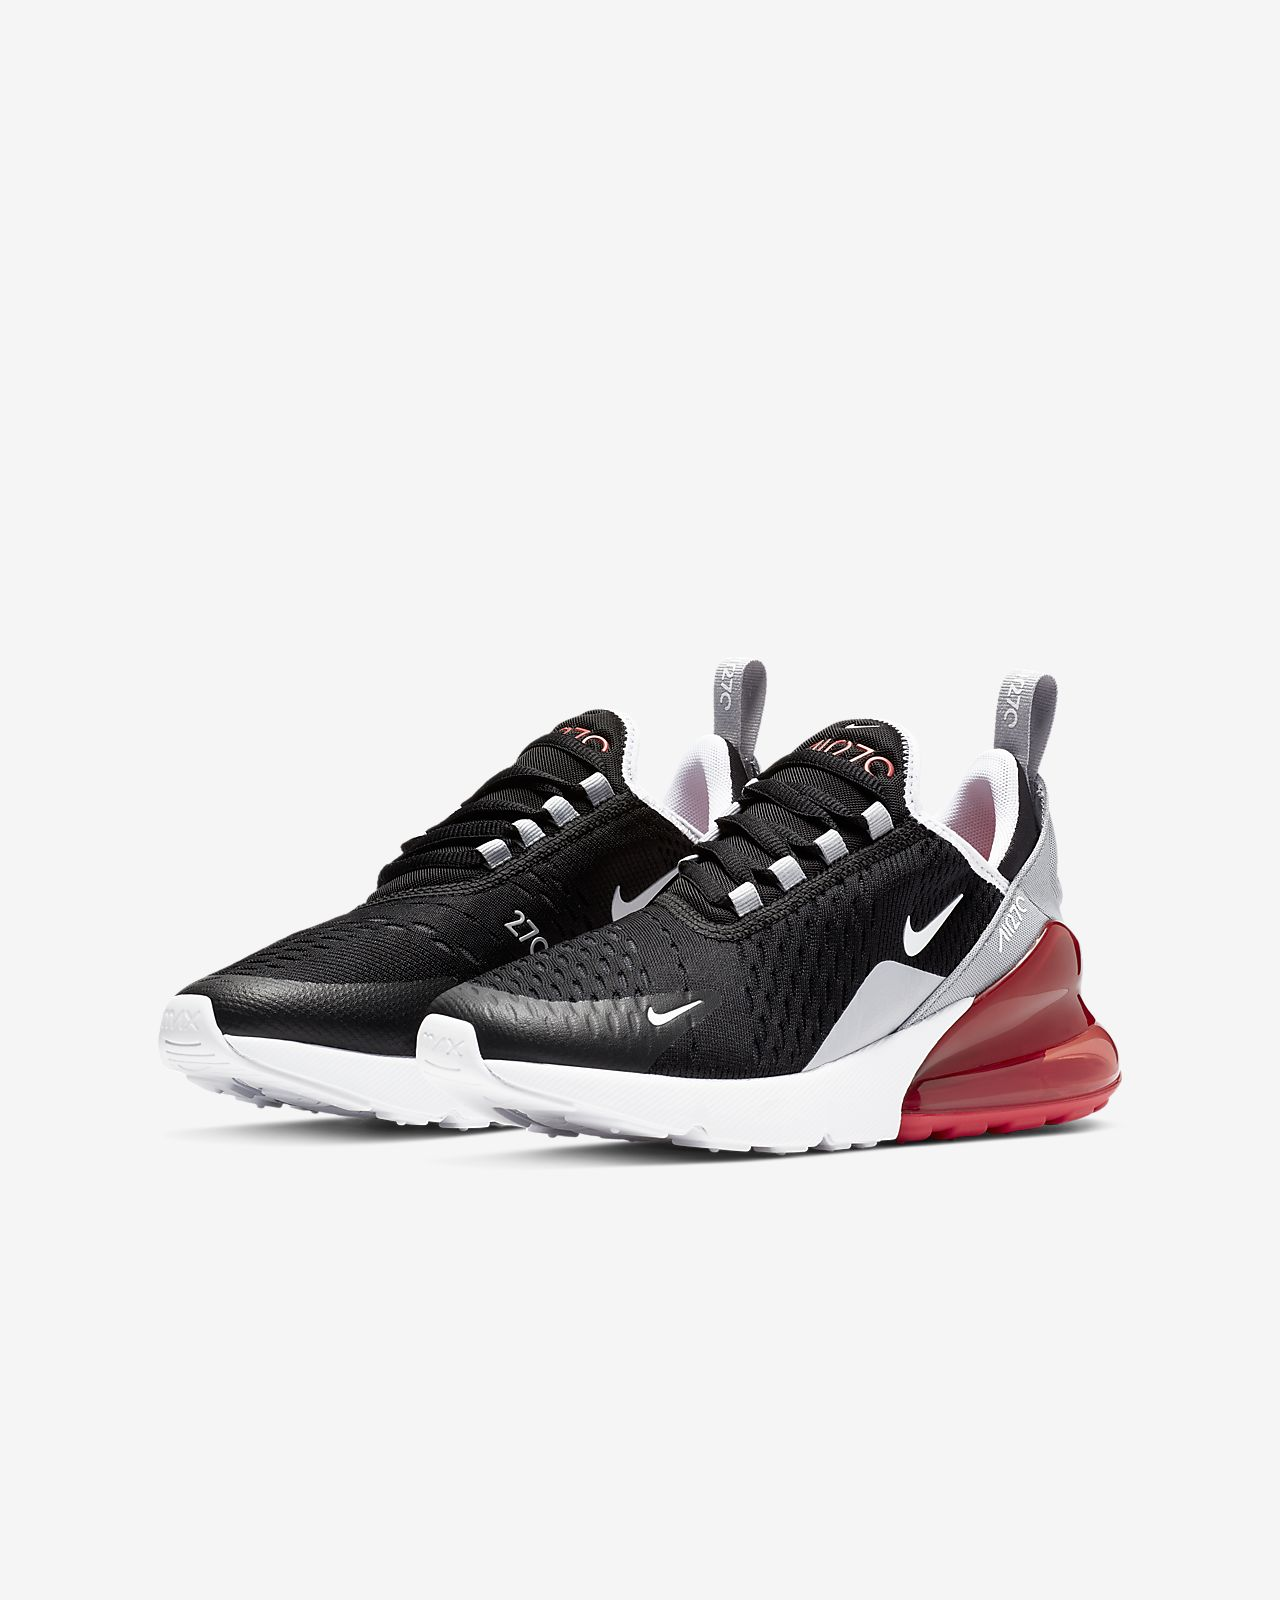 bfd7ee649cdc Nike Air Max 270 Older Kids  Shoe. Nike.com SG